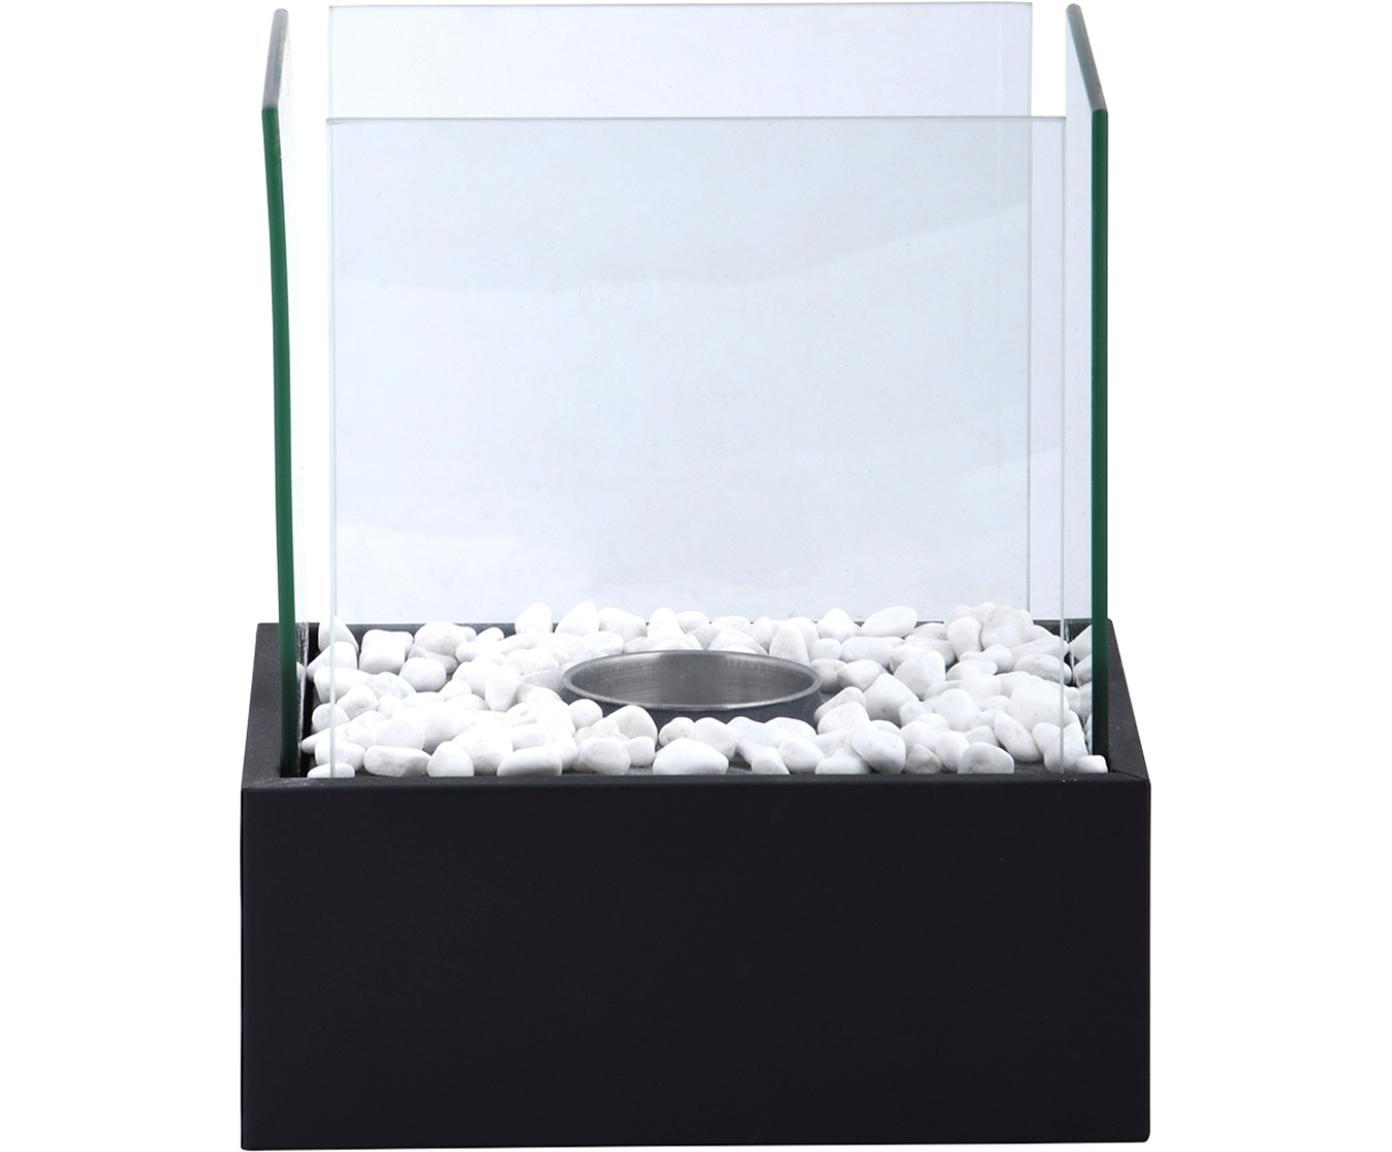 Bioethanolbrander Damin, Metaal, glas, Zwart, transparant, 25 x 28 cm